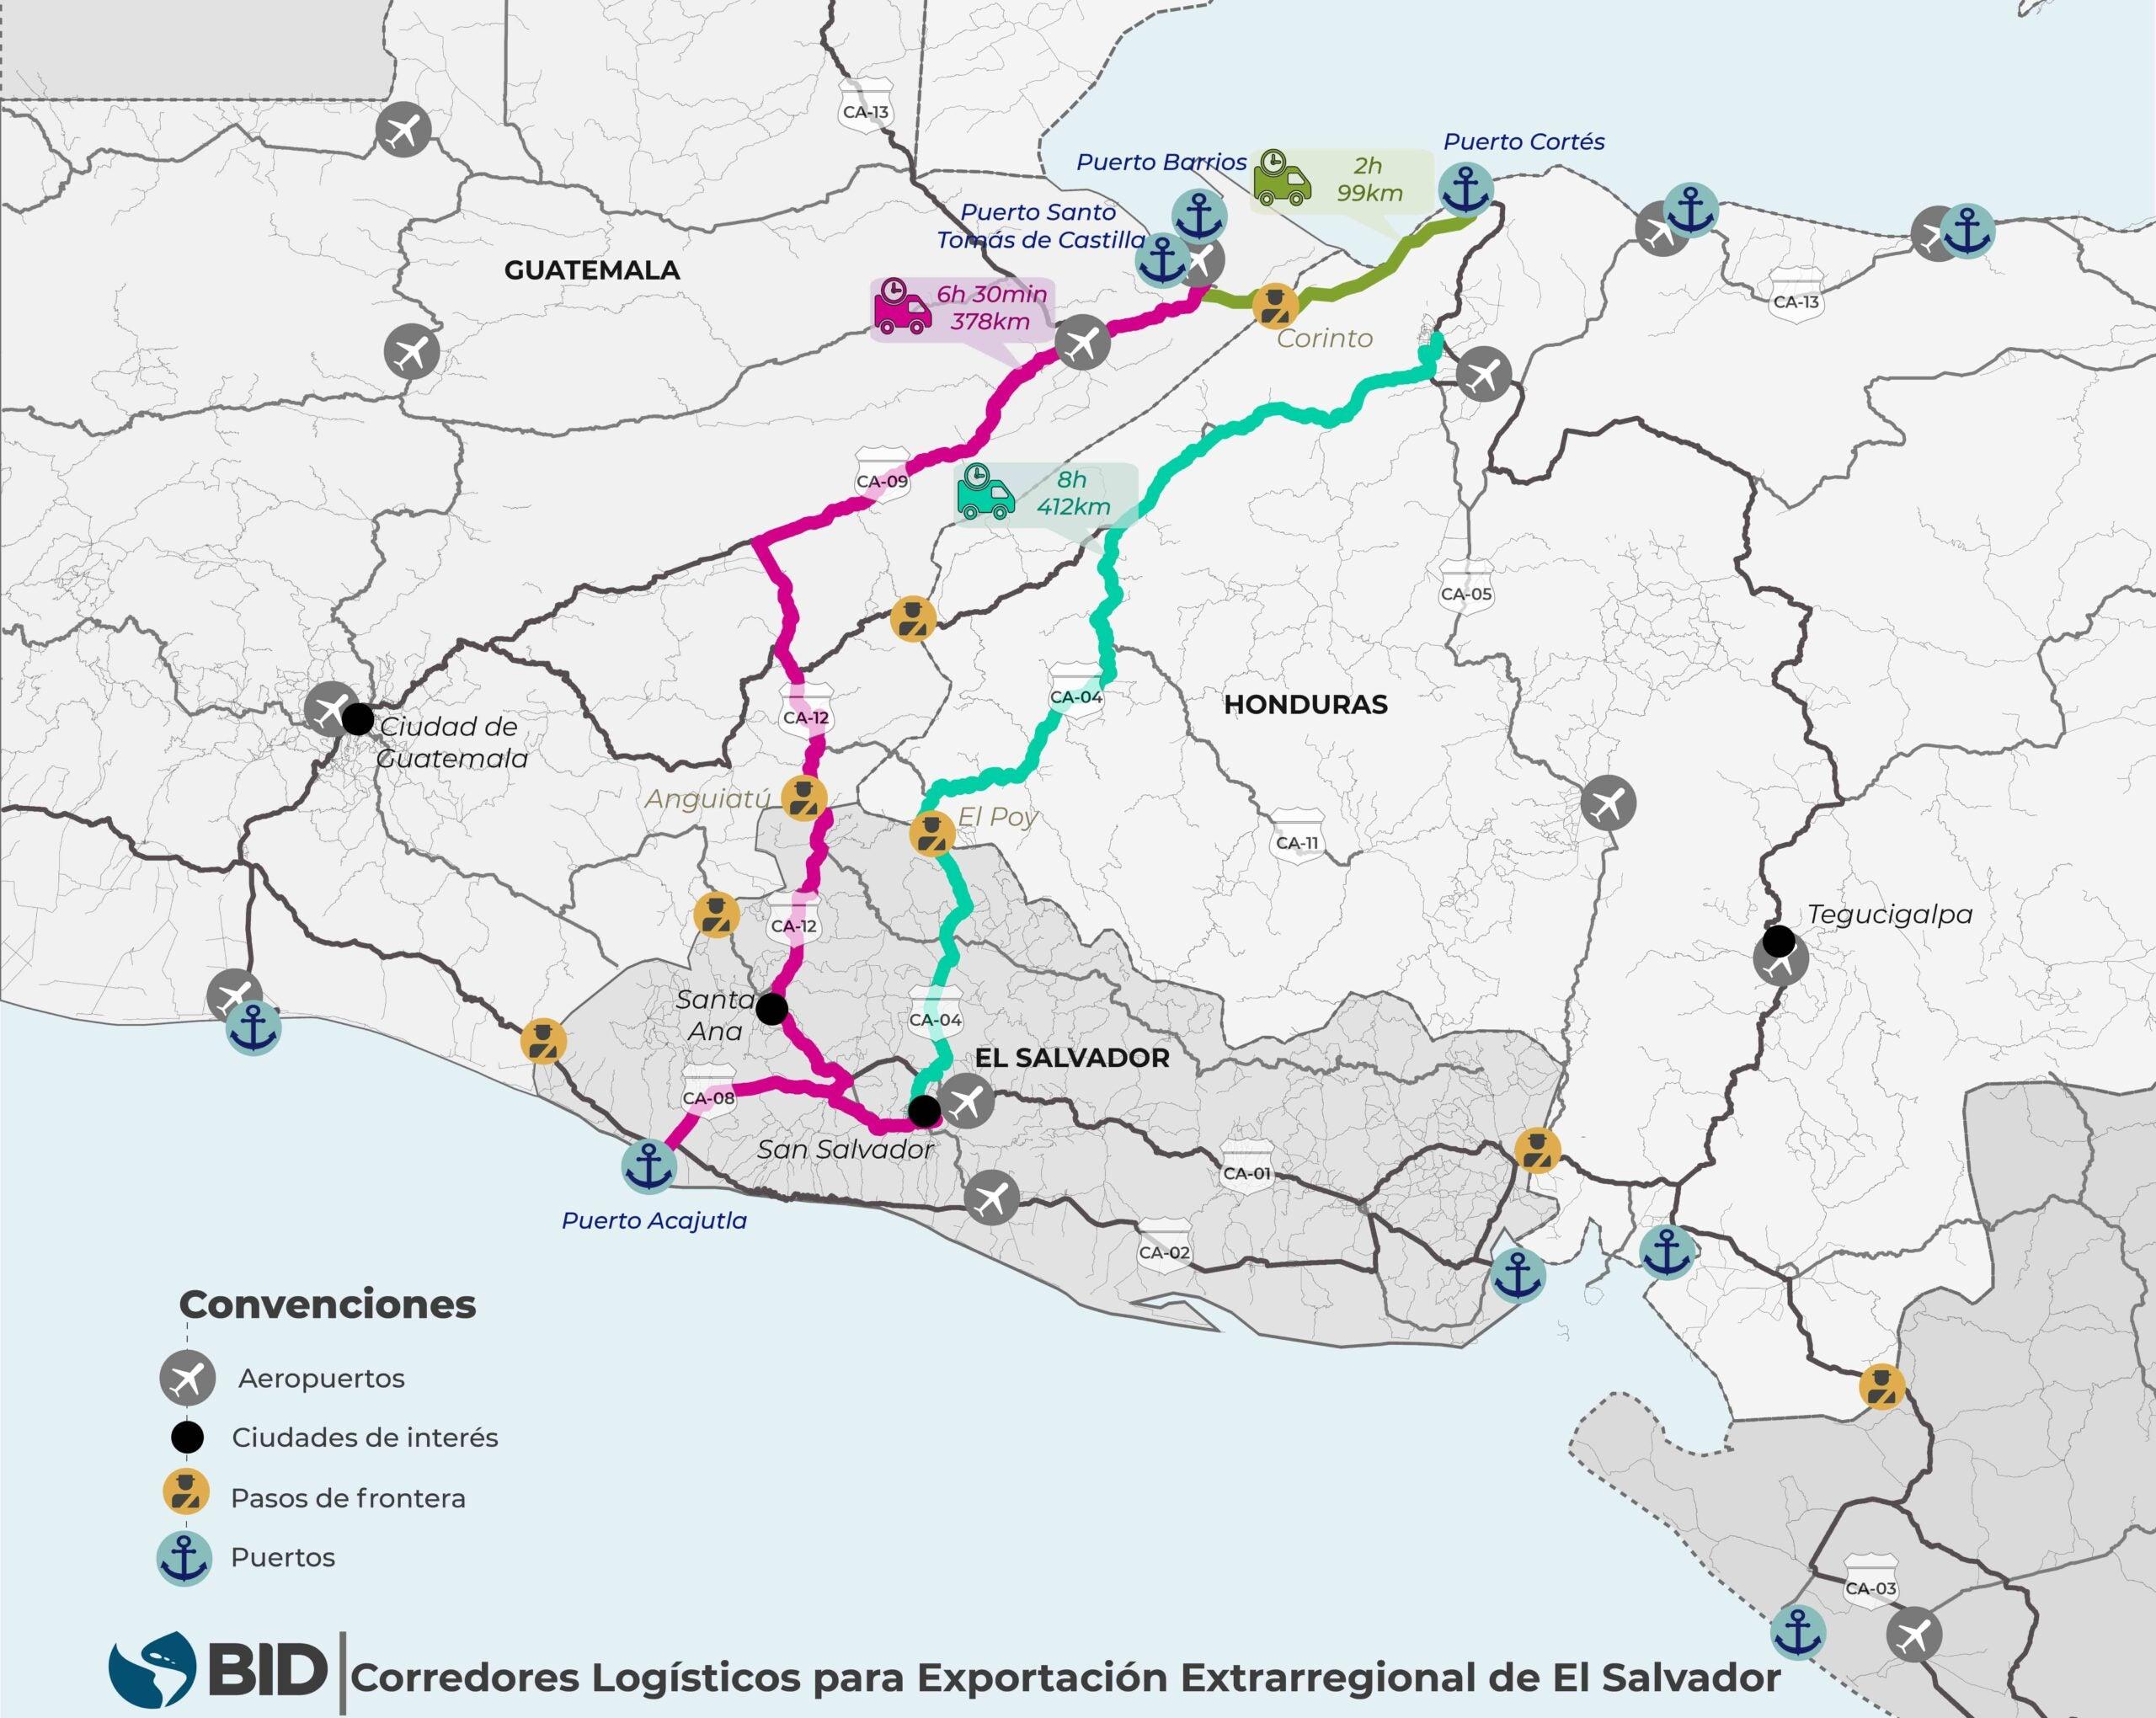 3 proyectos de infraestructura de integración de alto impacto para 3 cadenas de valor de América Latina